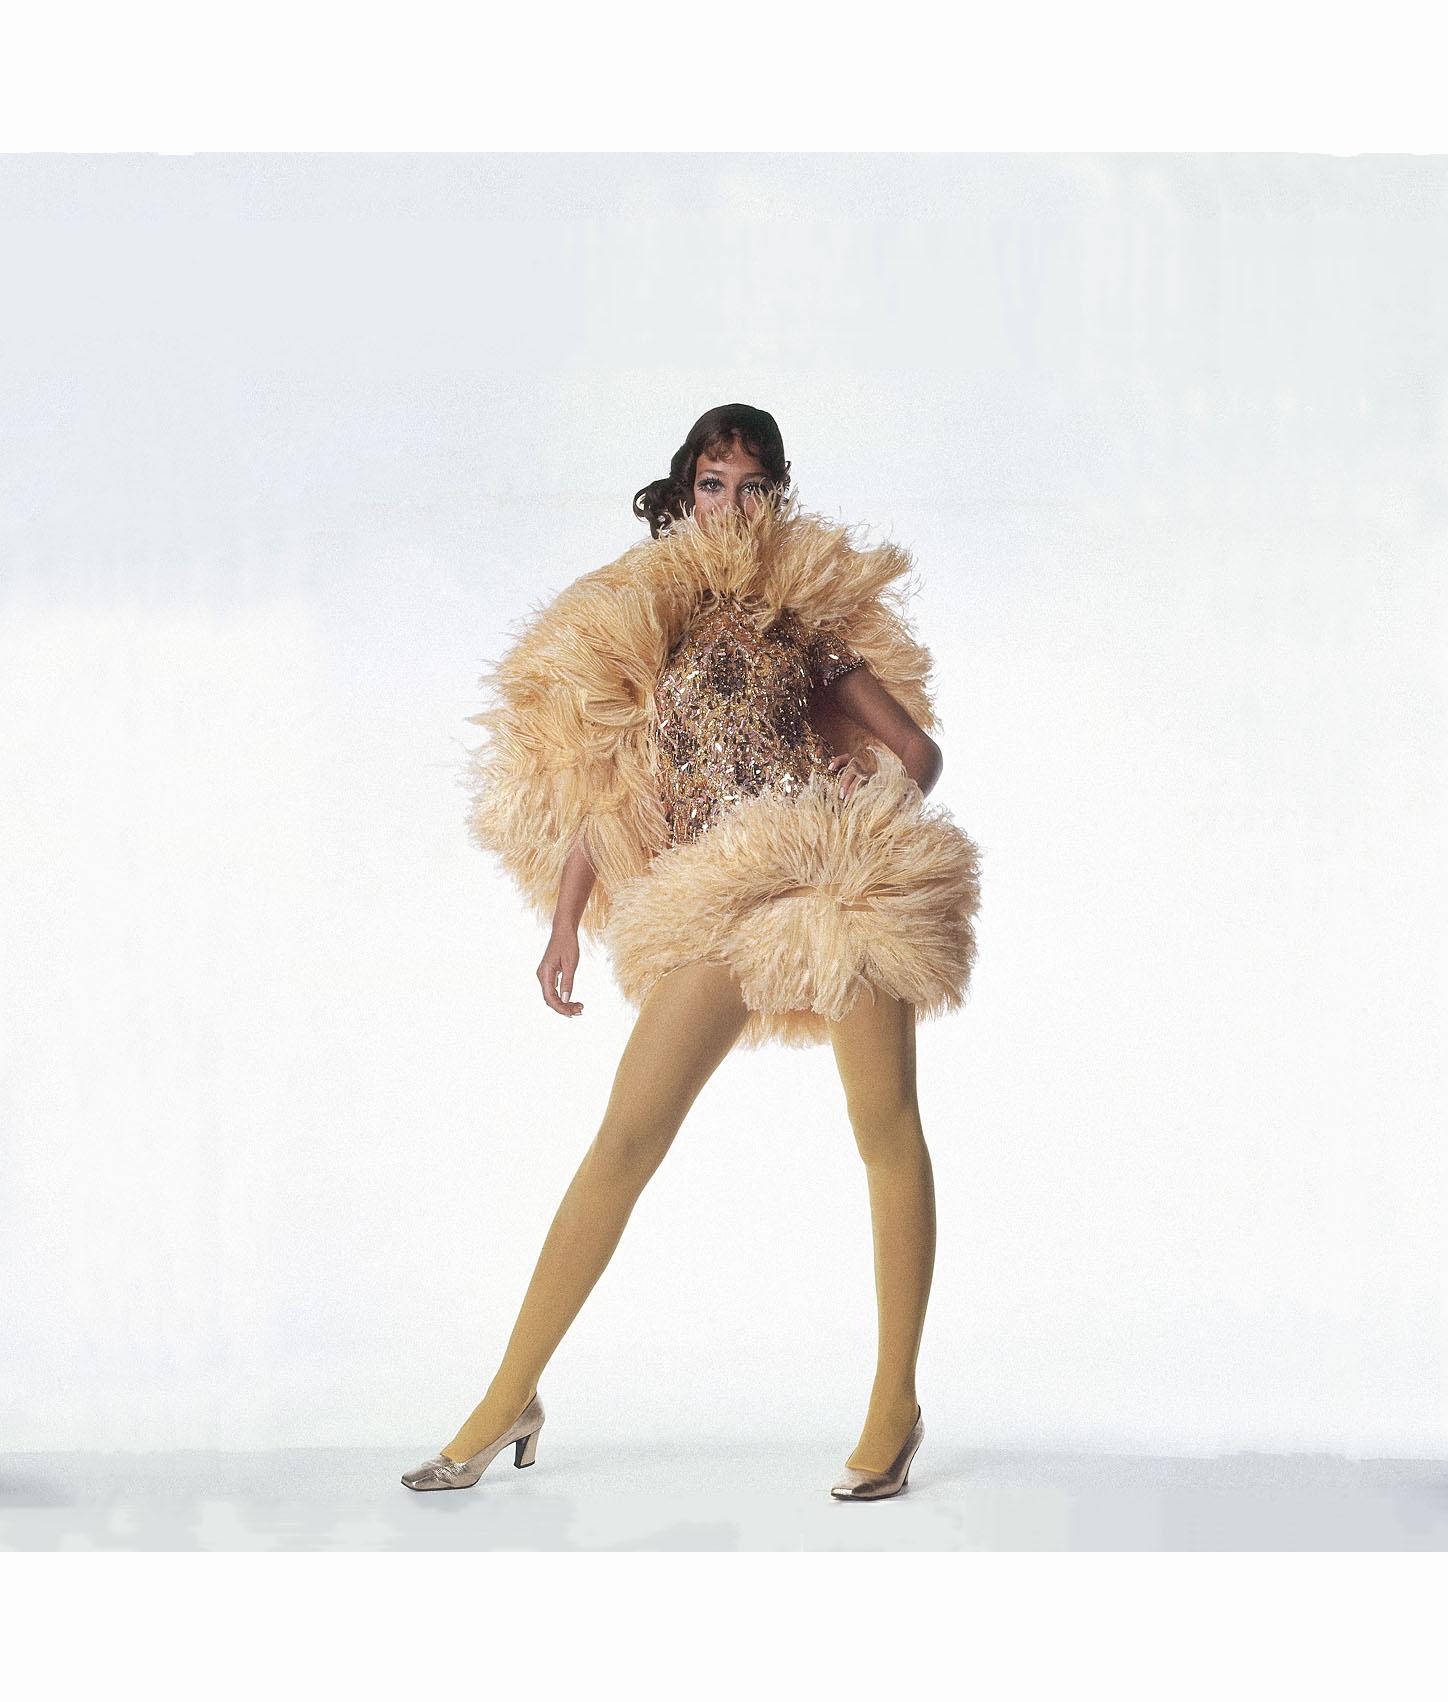 Yves Saint Laurent Pleasurephoto Pagina 19 Bettina Heels Netty Beige 1967 09 3 134949536633